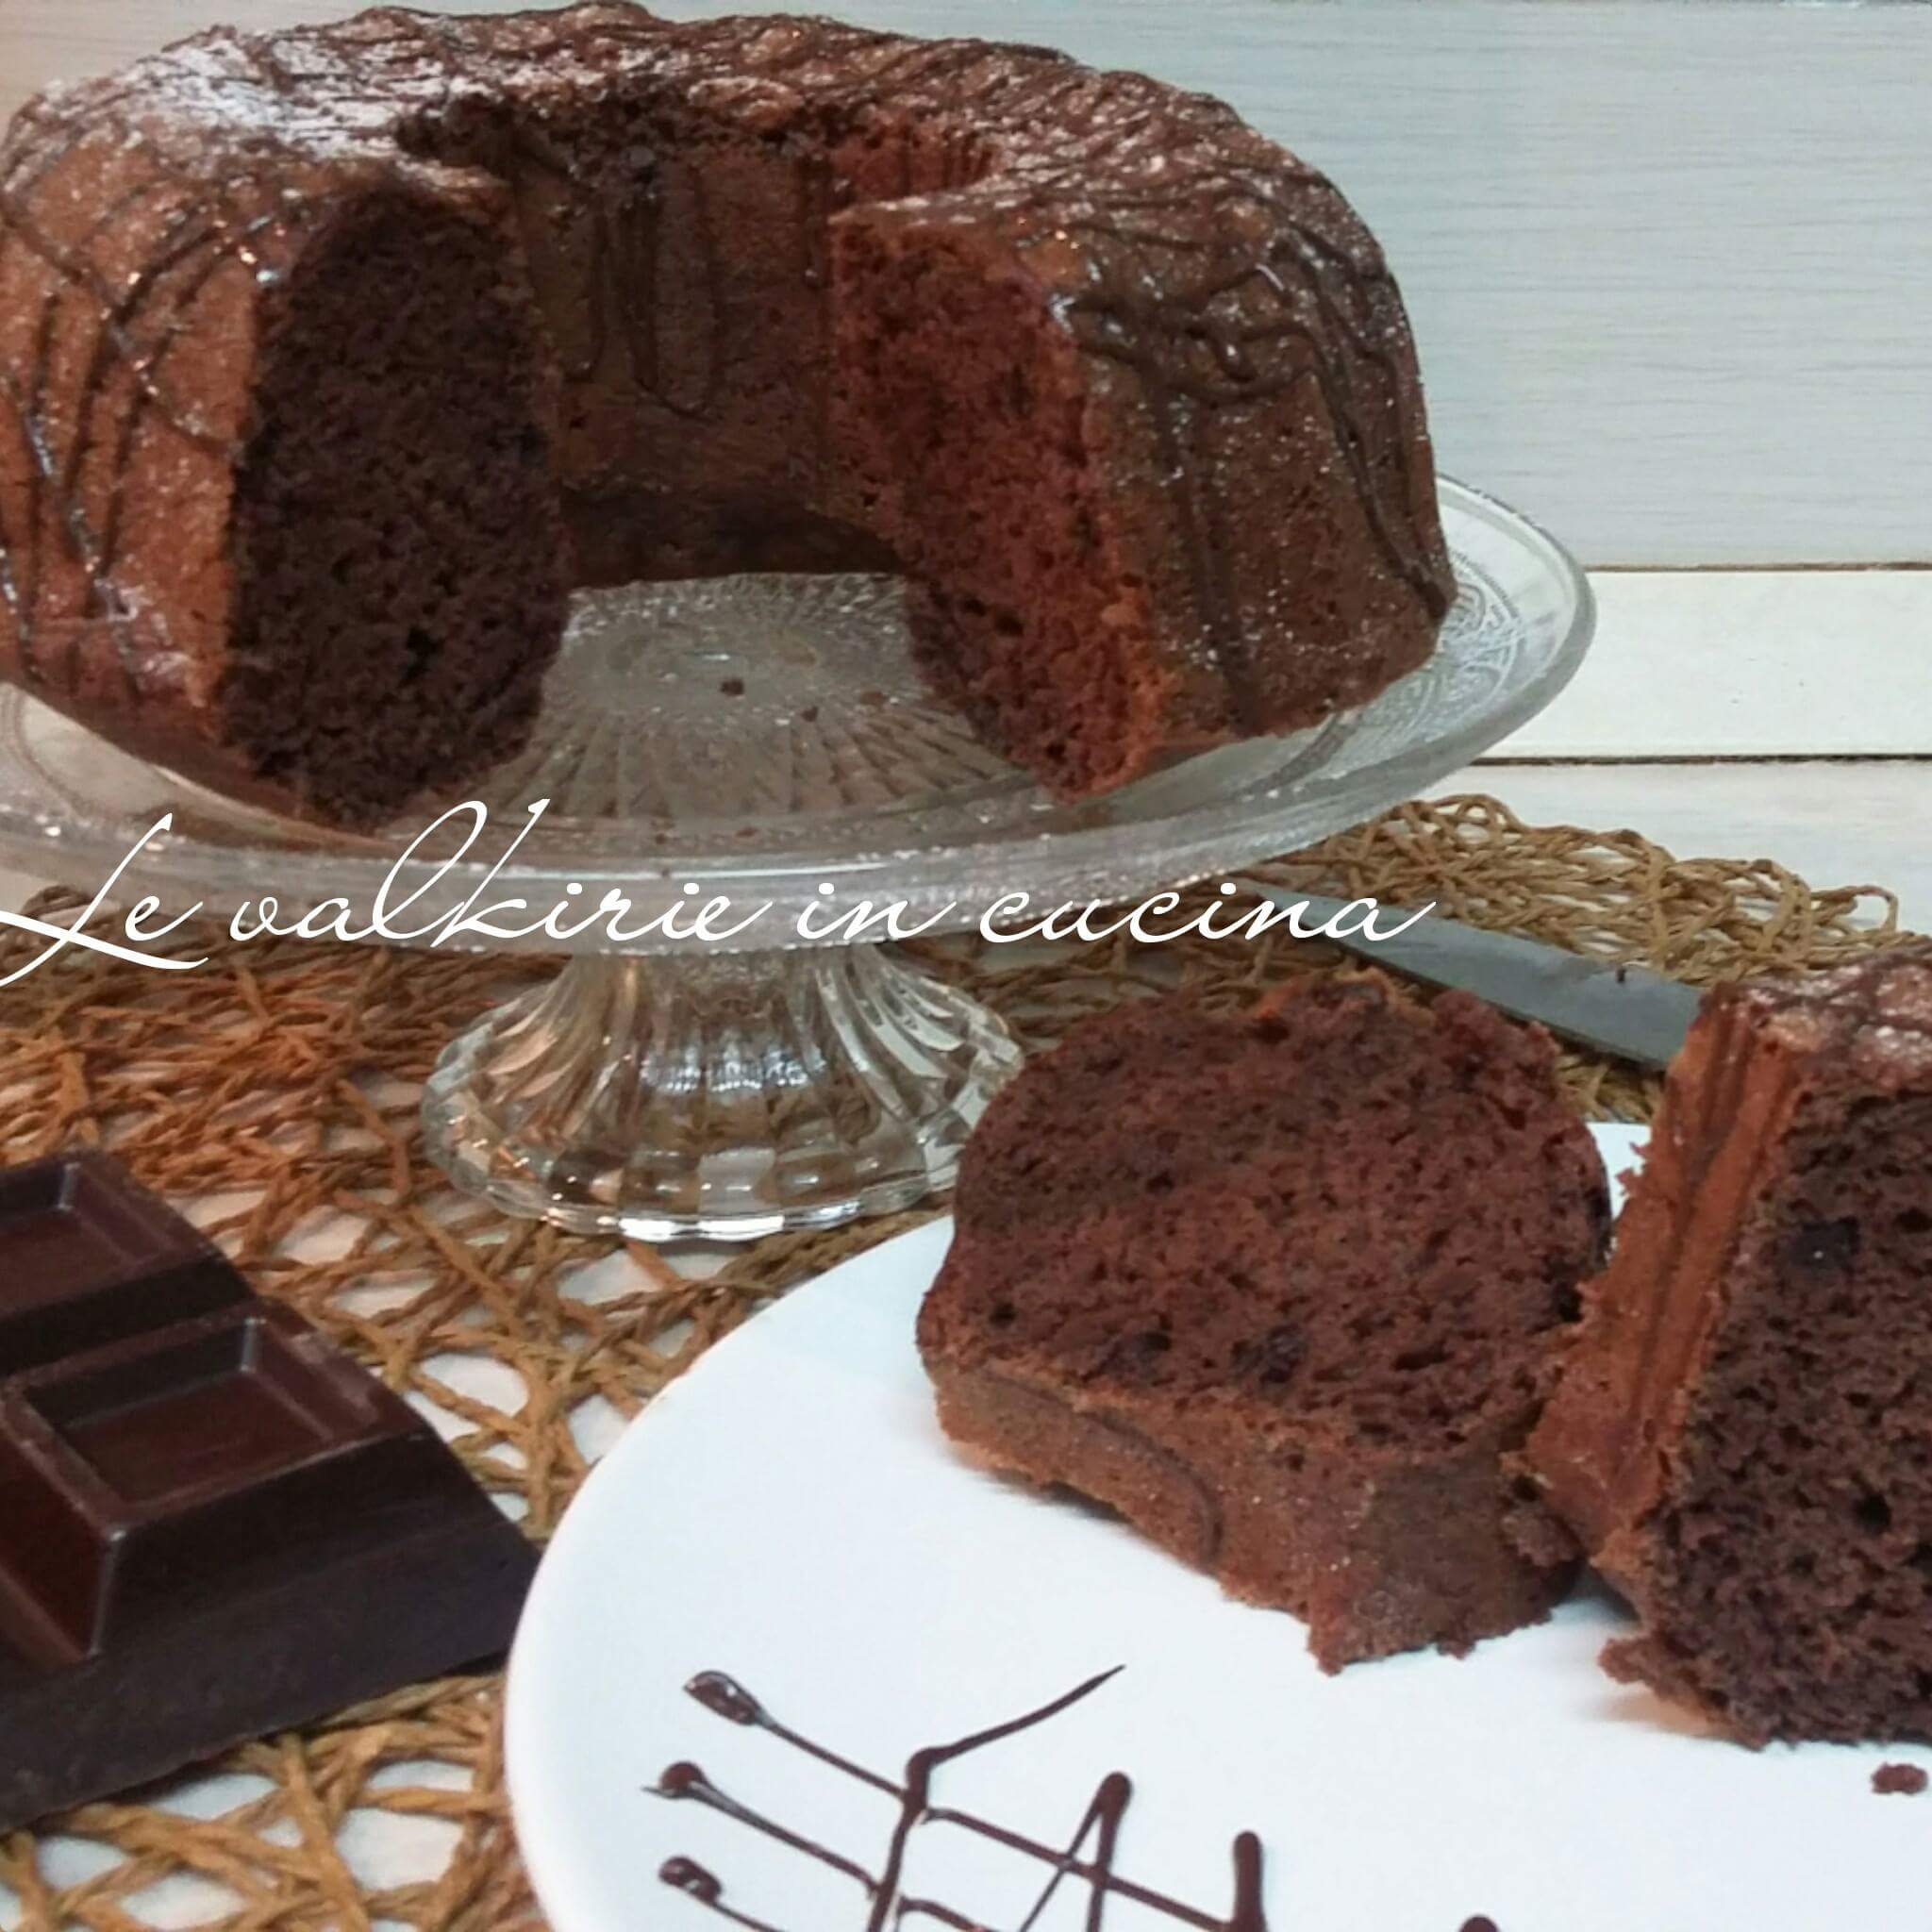 Torta Nuvola al Cacao con solo Albumi